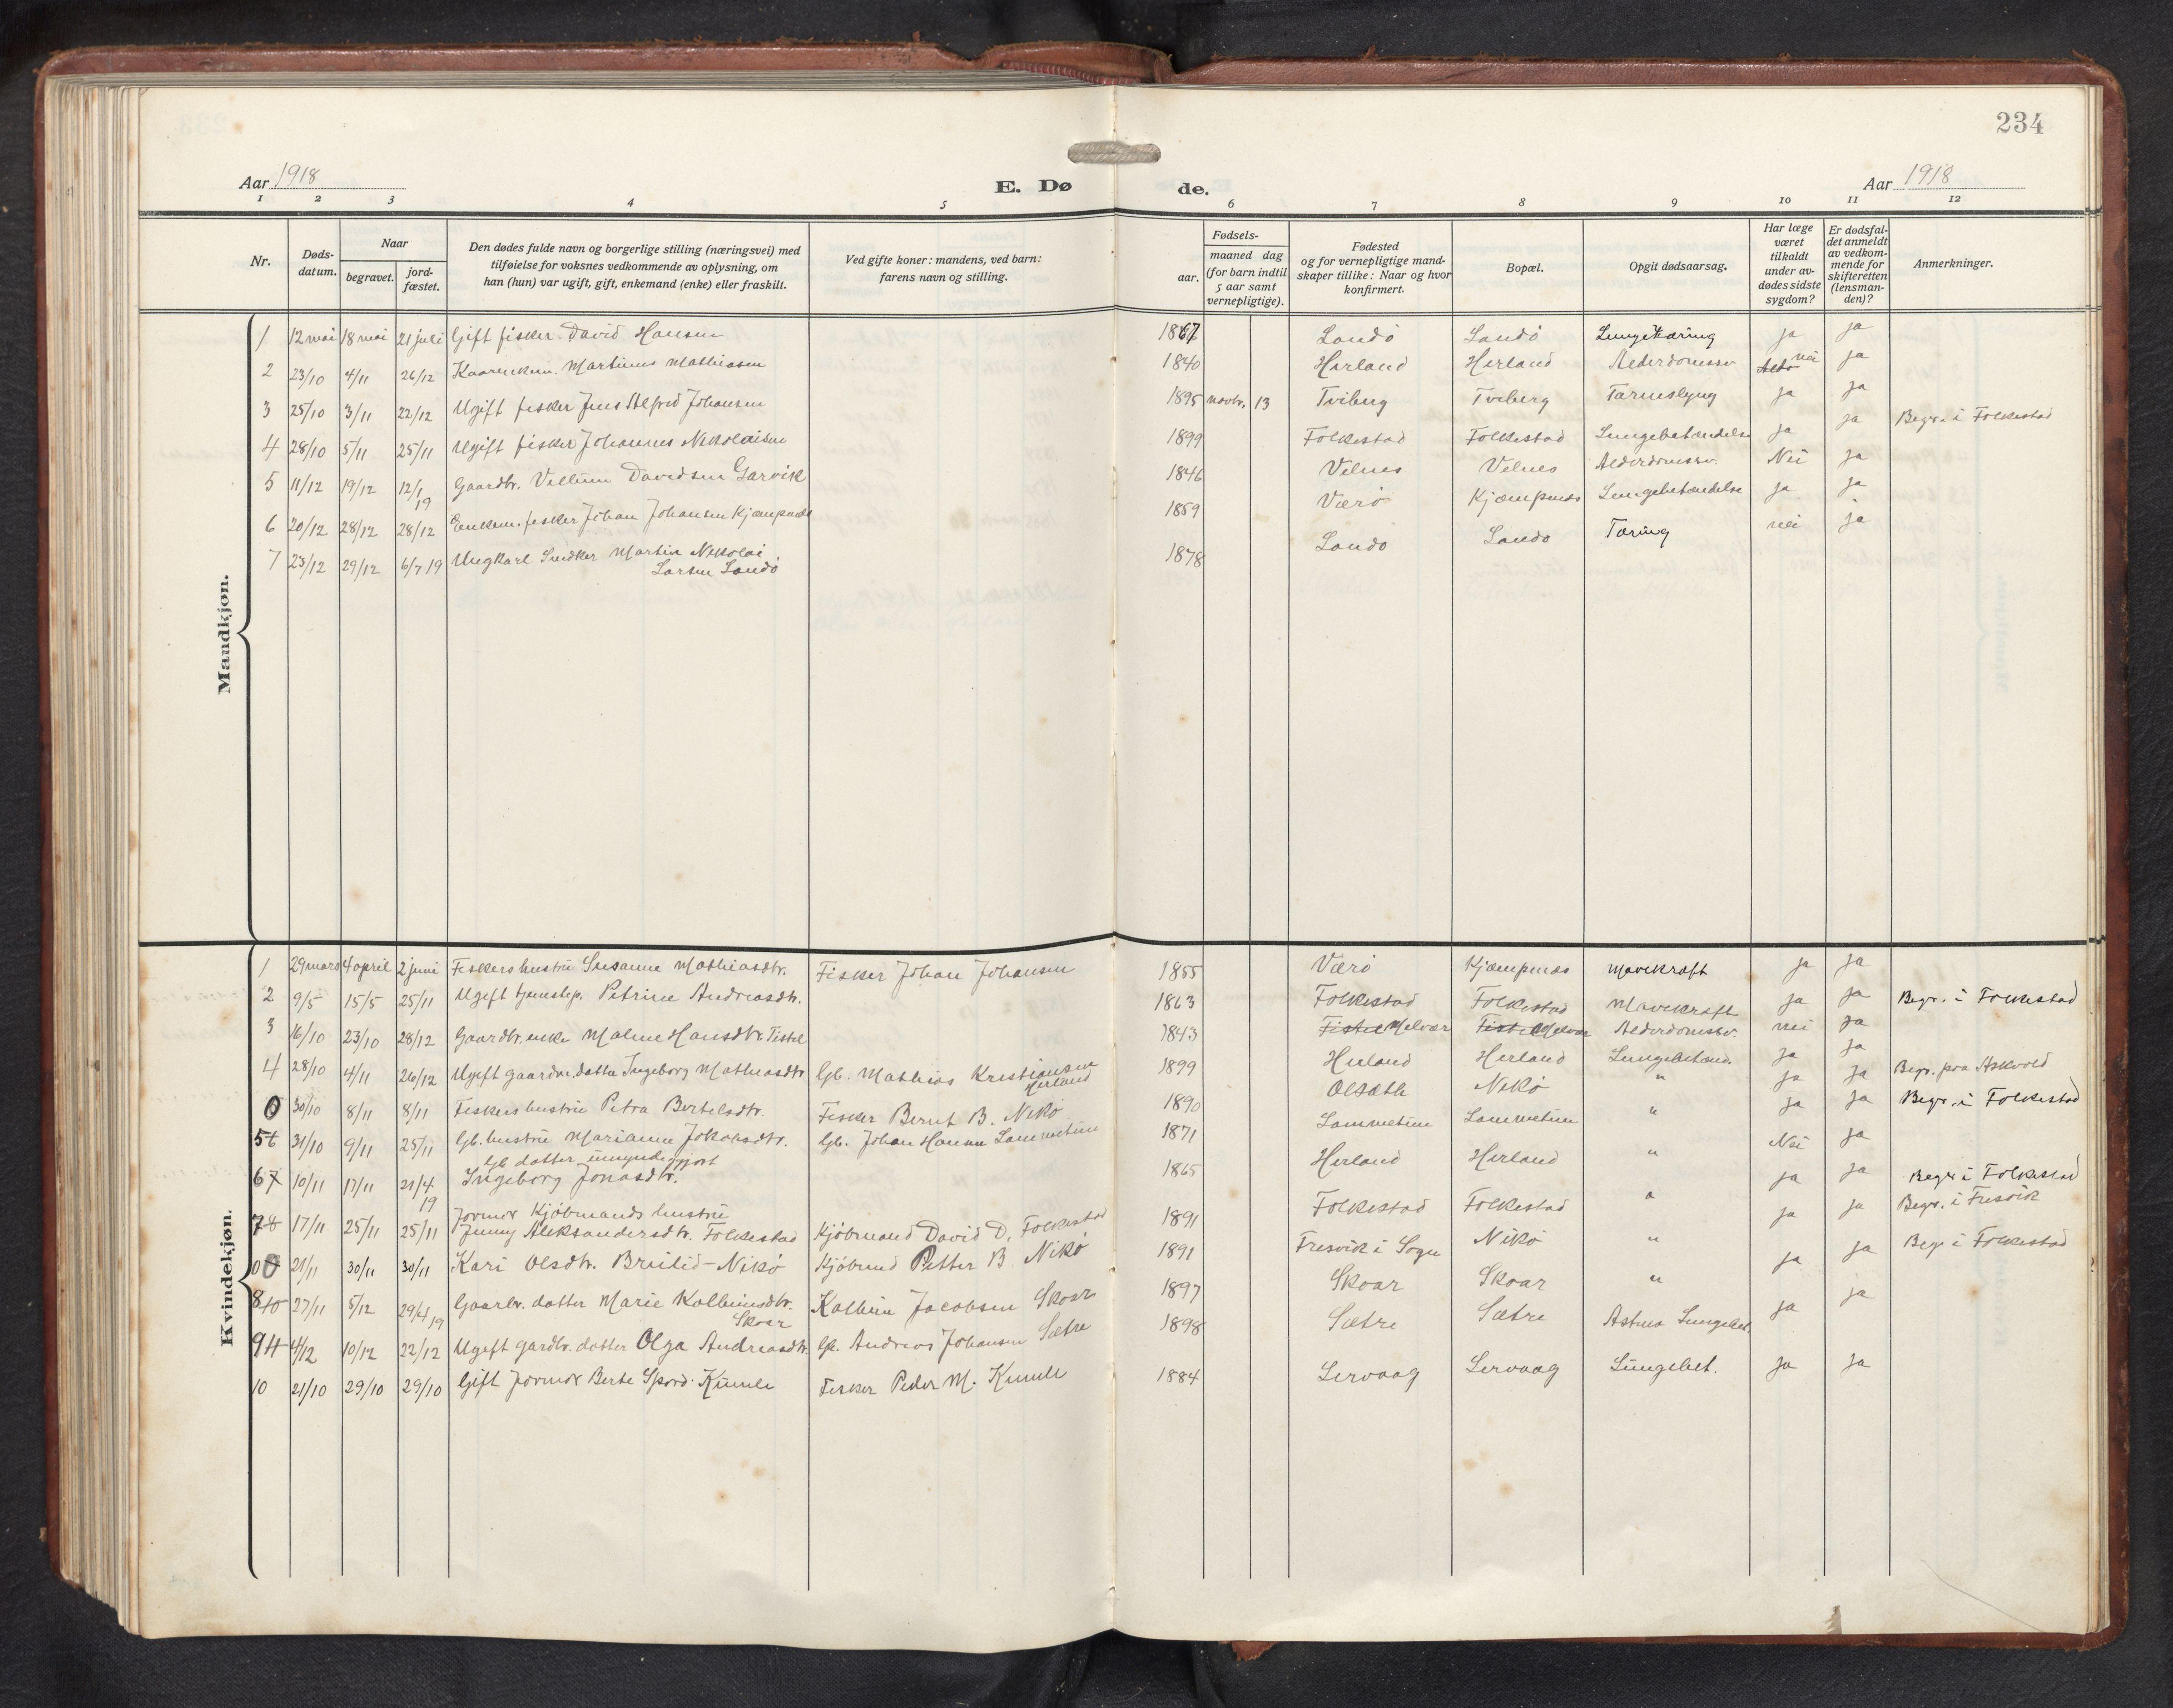 SAB, Askvoll sokneprestembete, H/Hab/Habb/L0002: Klokkerbok nr. B 2, 1910-1947, s. 233b-234a